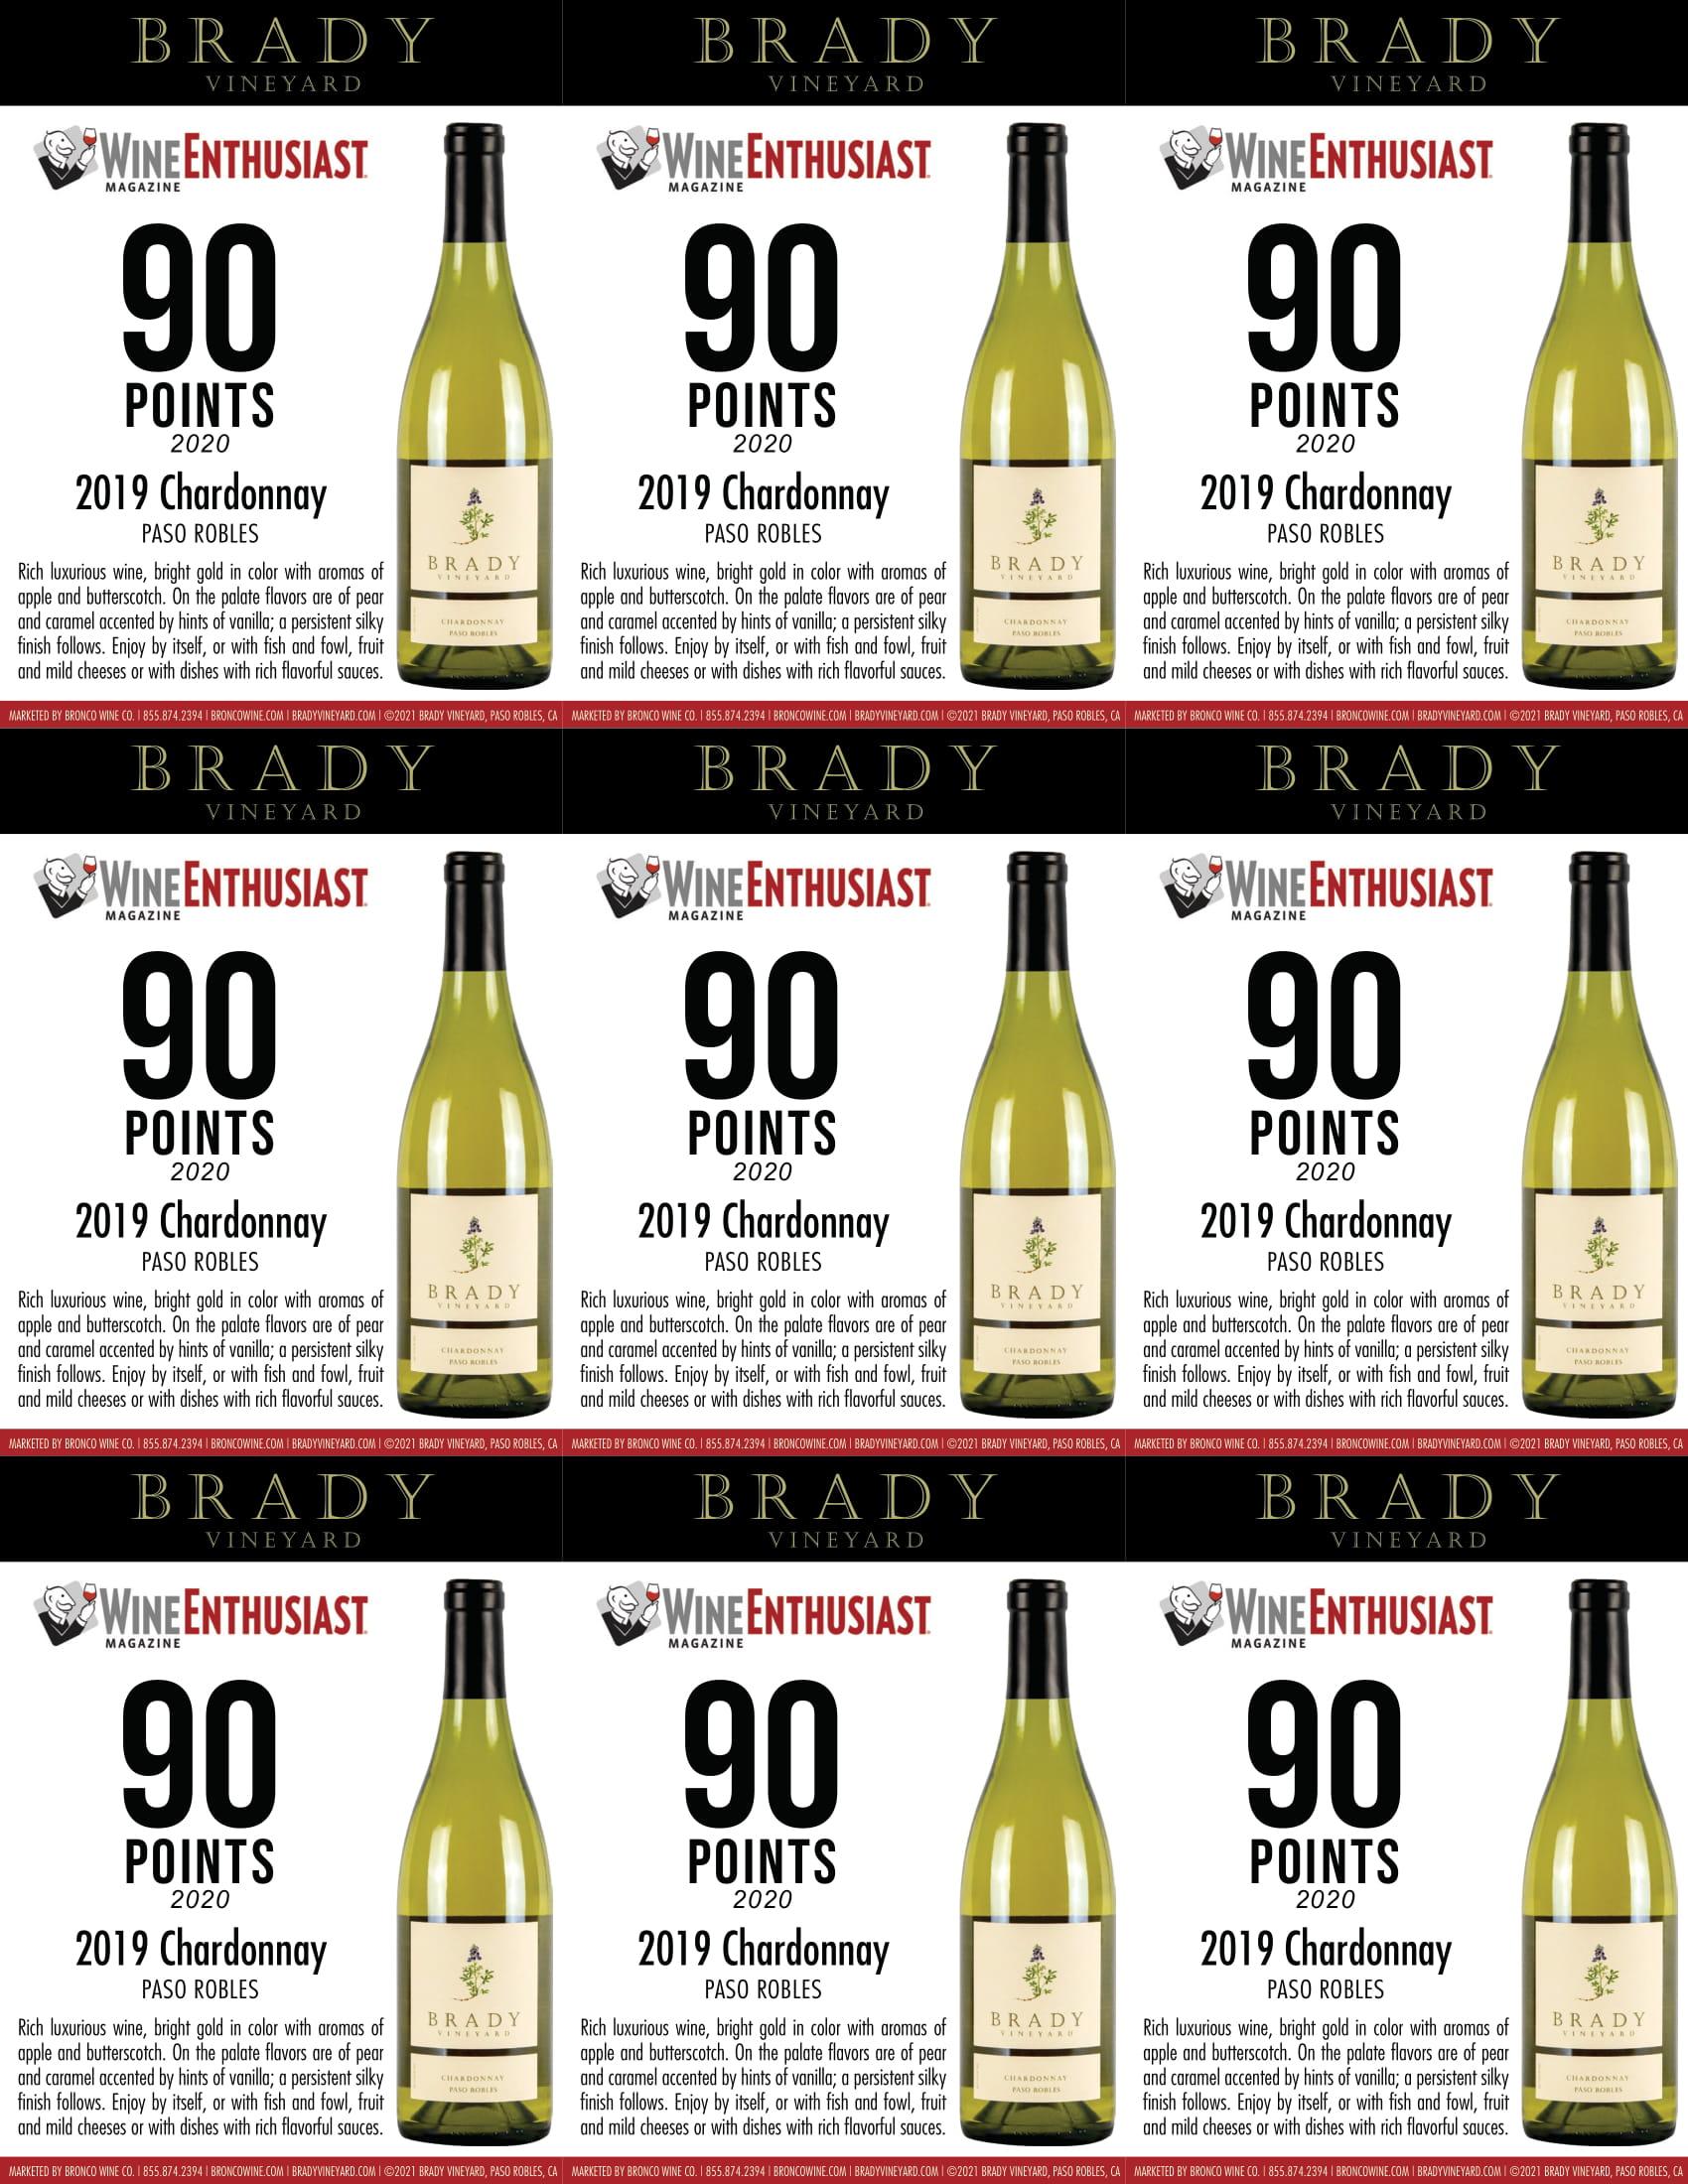 Brady Vineyards Chardonnay Shelf Talkers